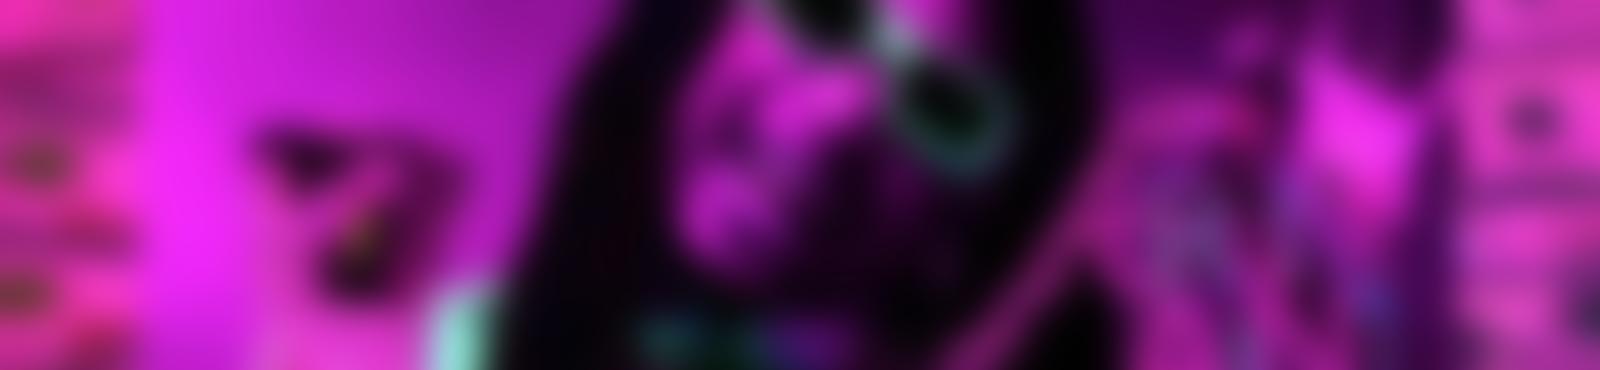 Blurred ffd45a46 8b9f 4354 b5e1 fcad78dc7386